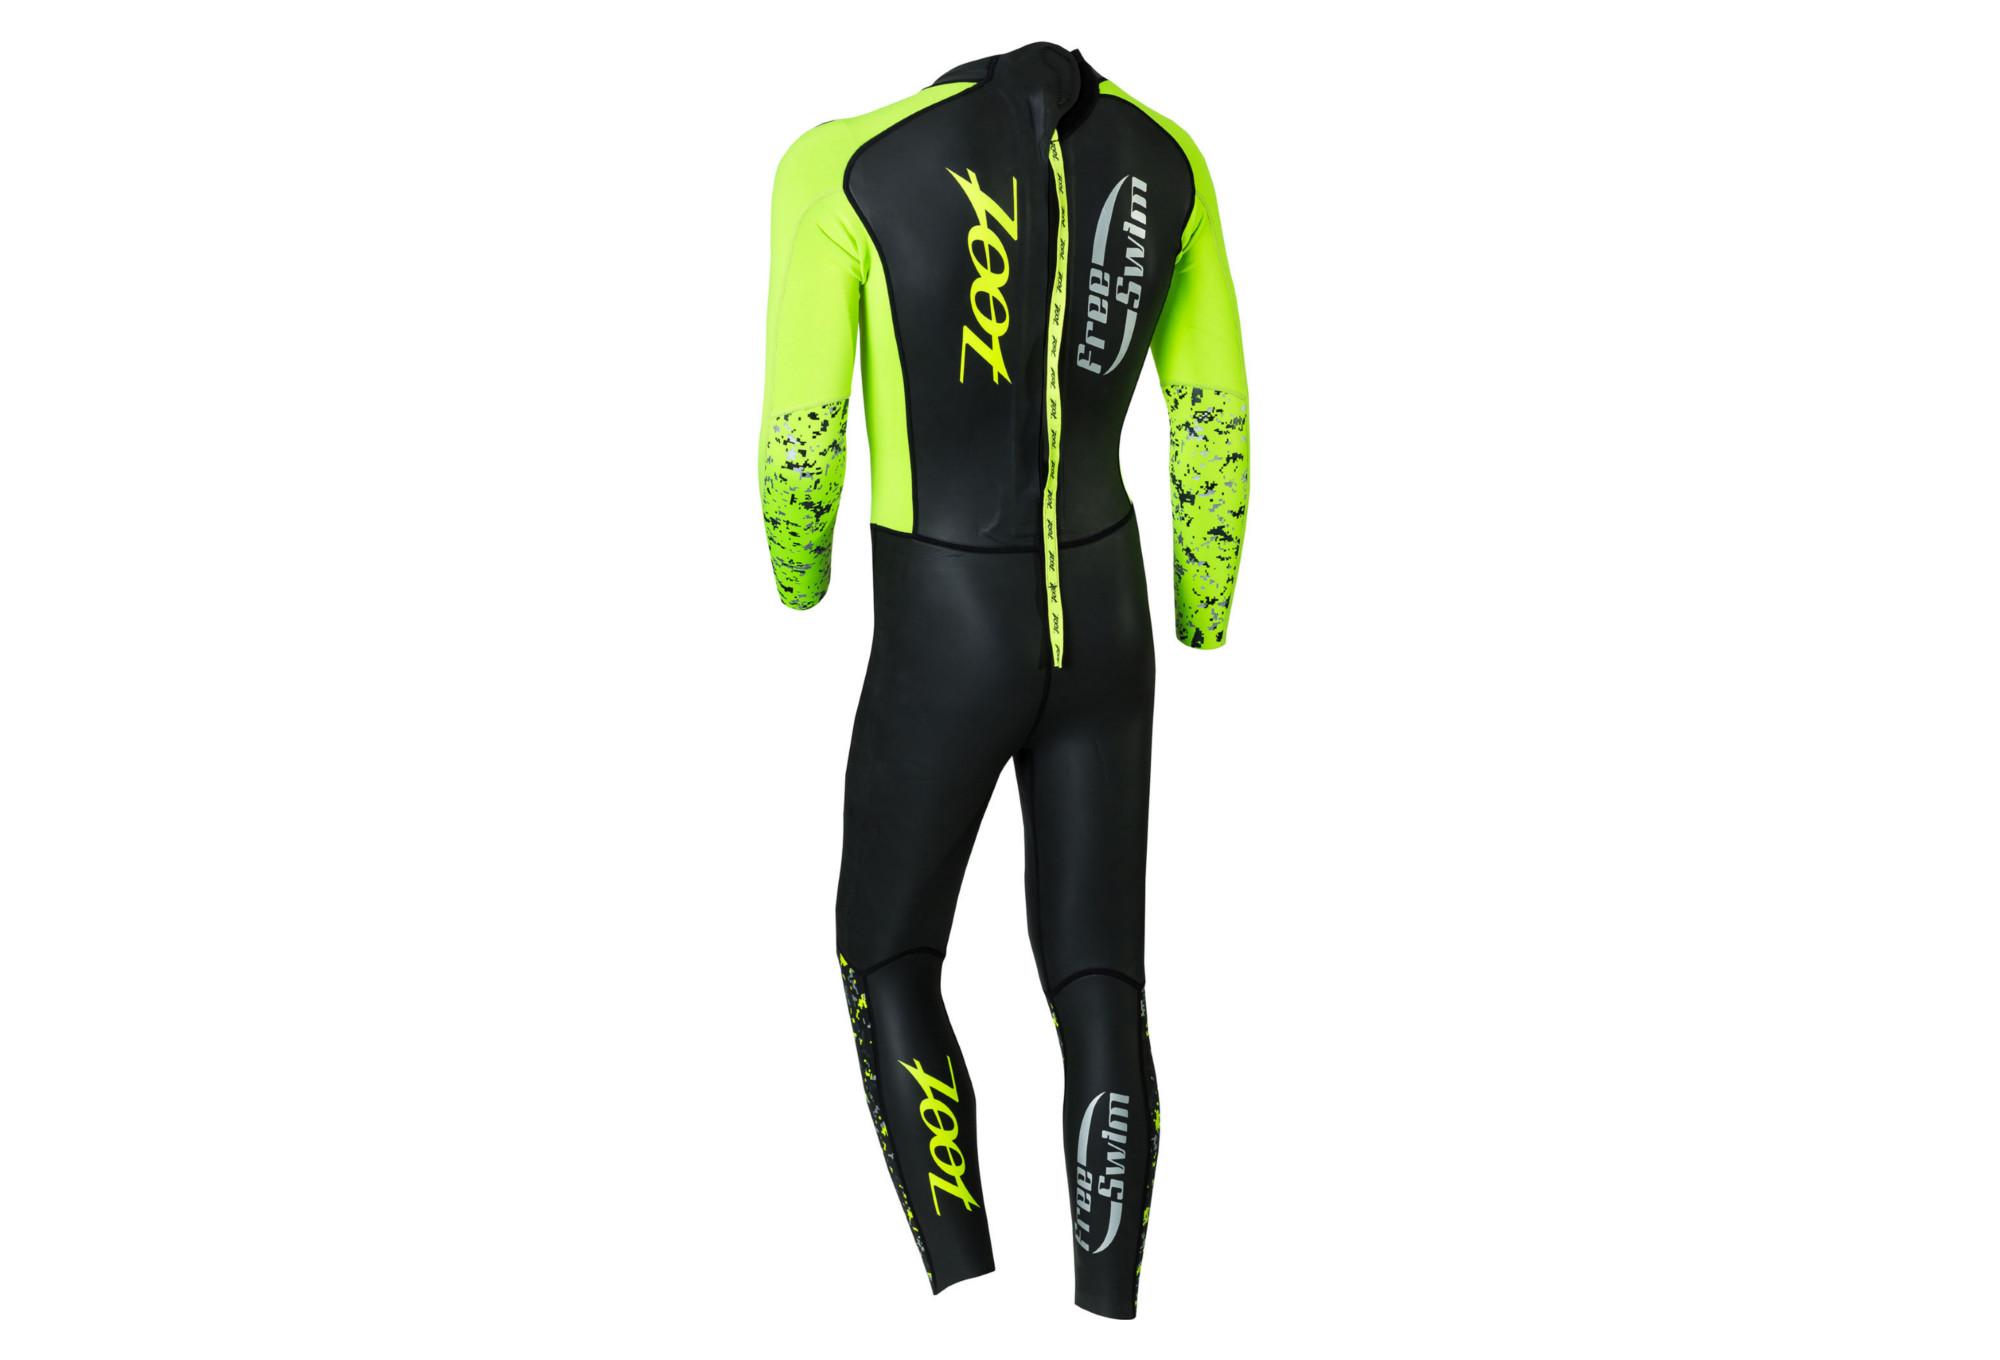 68157bee8d0b Zoot Wave Free Swim Wetsuit Black Yellow